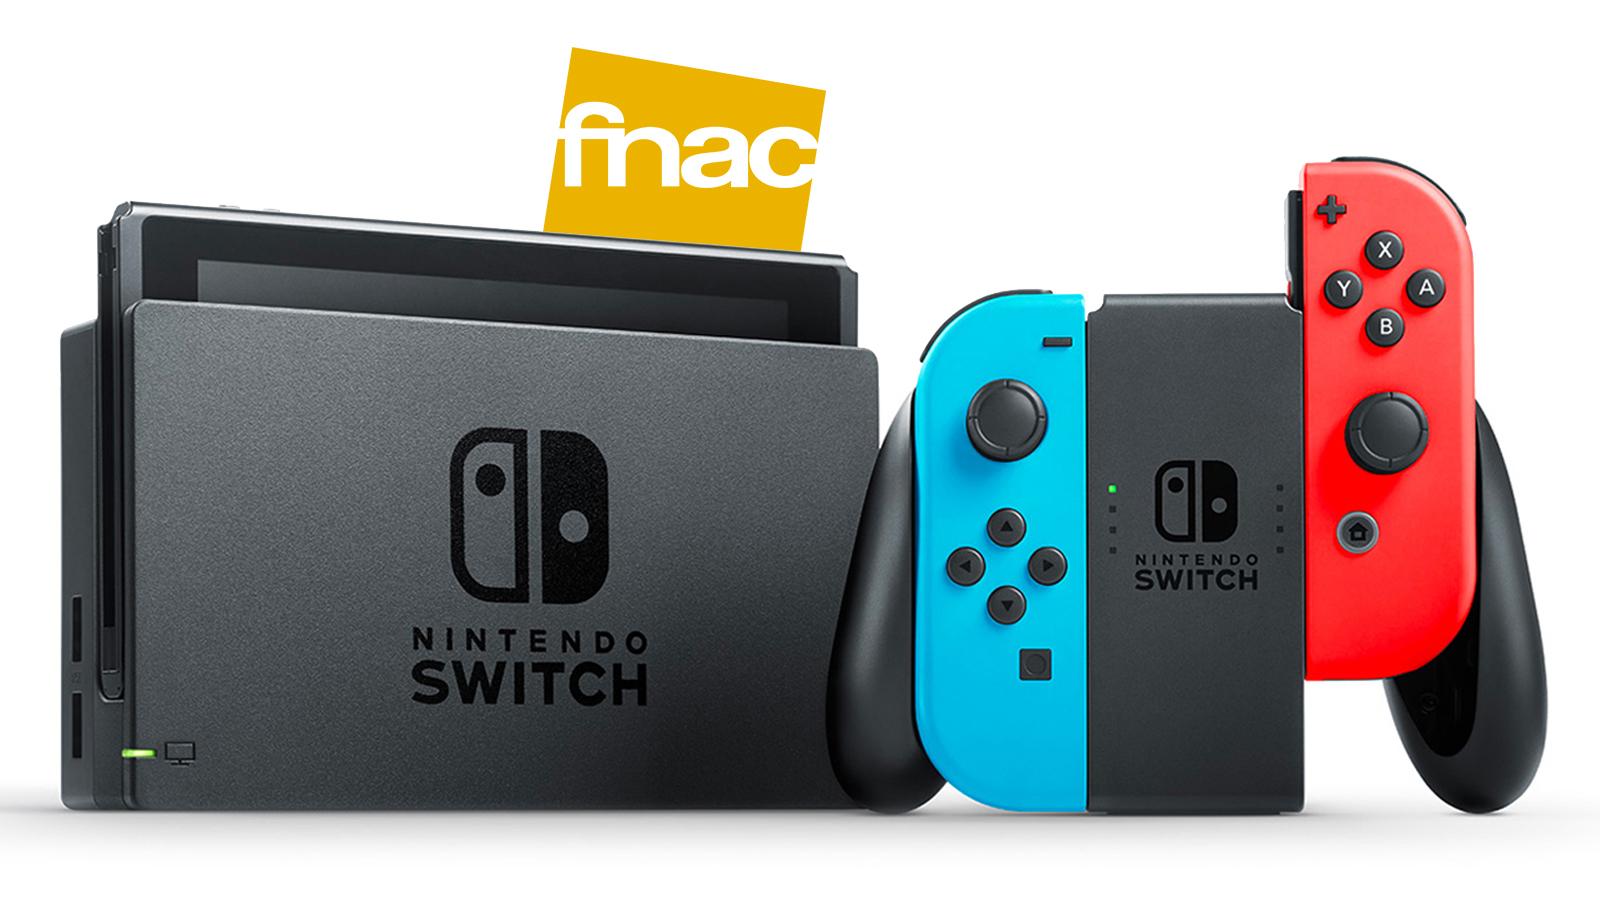 Carte Cadeau Nintendo Fnac.Soldes Fnac Nintendo Switch A 299 99 35 Eshop 44